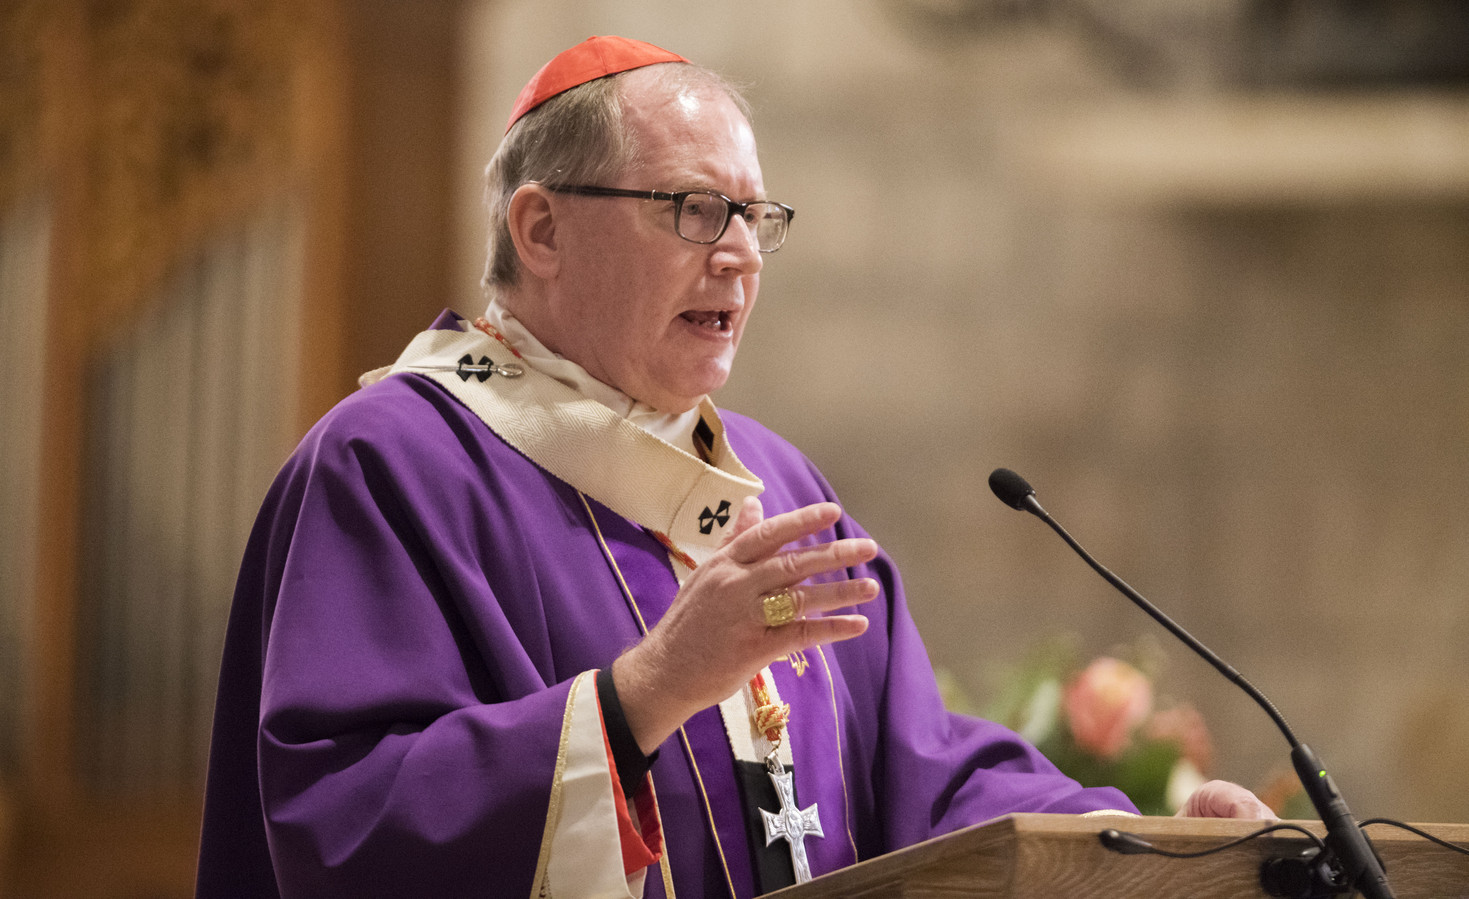 Kardinaal Eijk